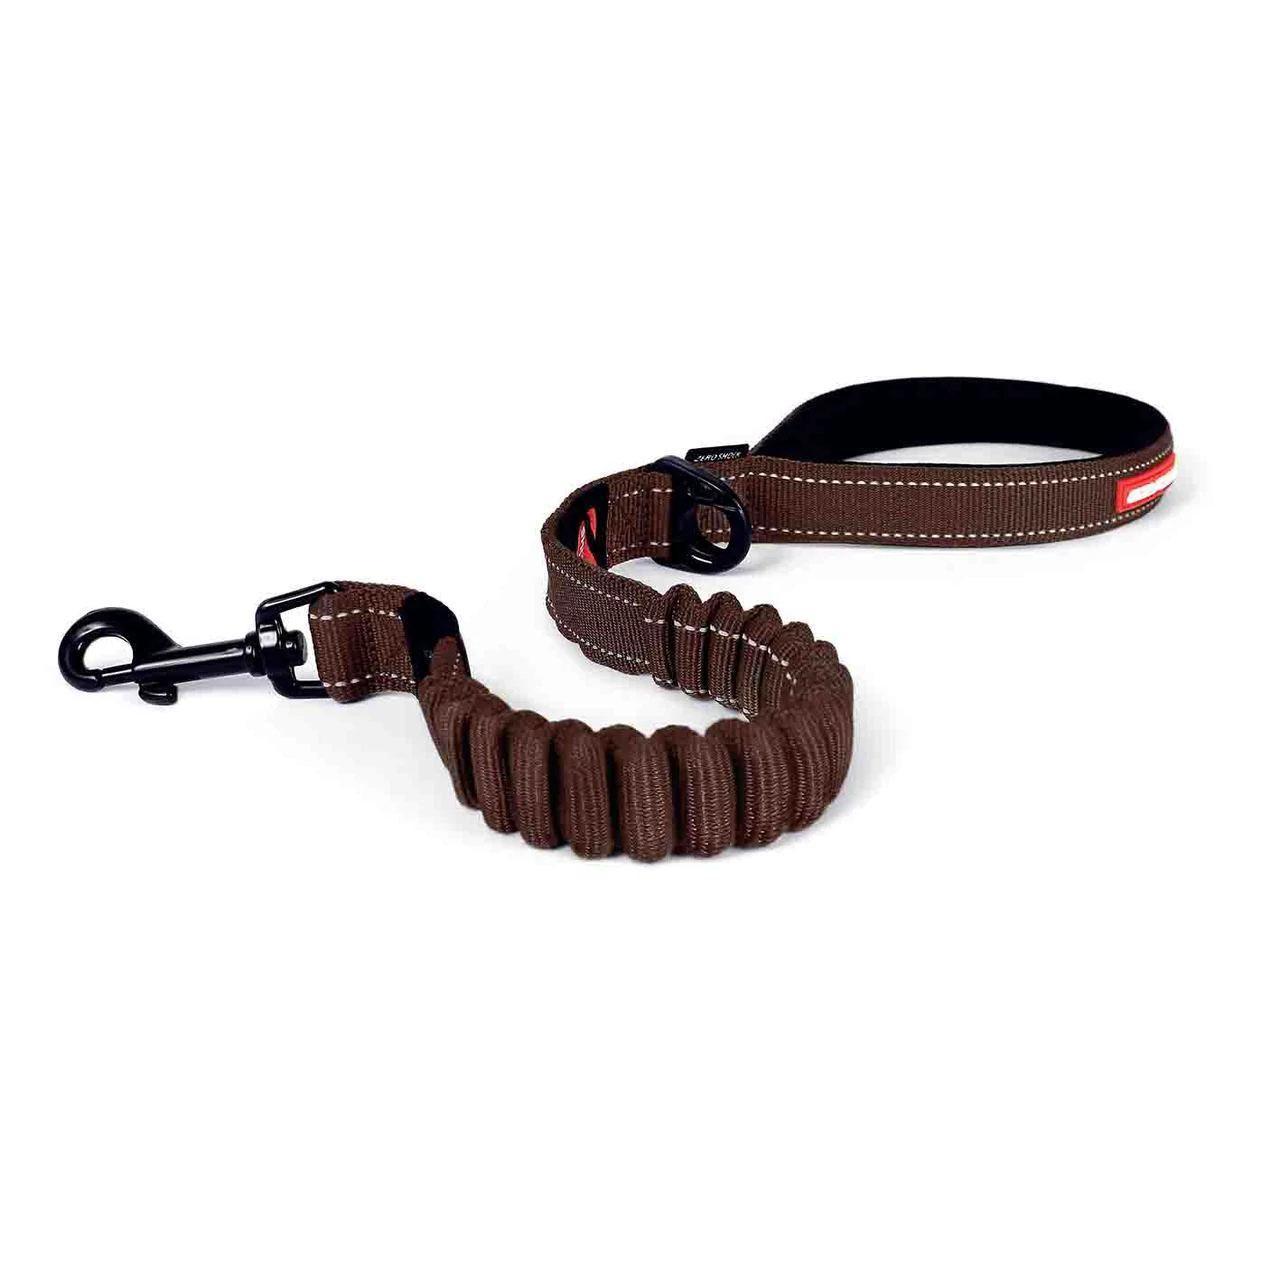 EzyDog Zero Shock Dog Leash - Chocolate